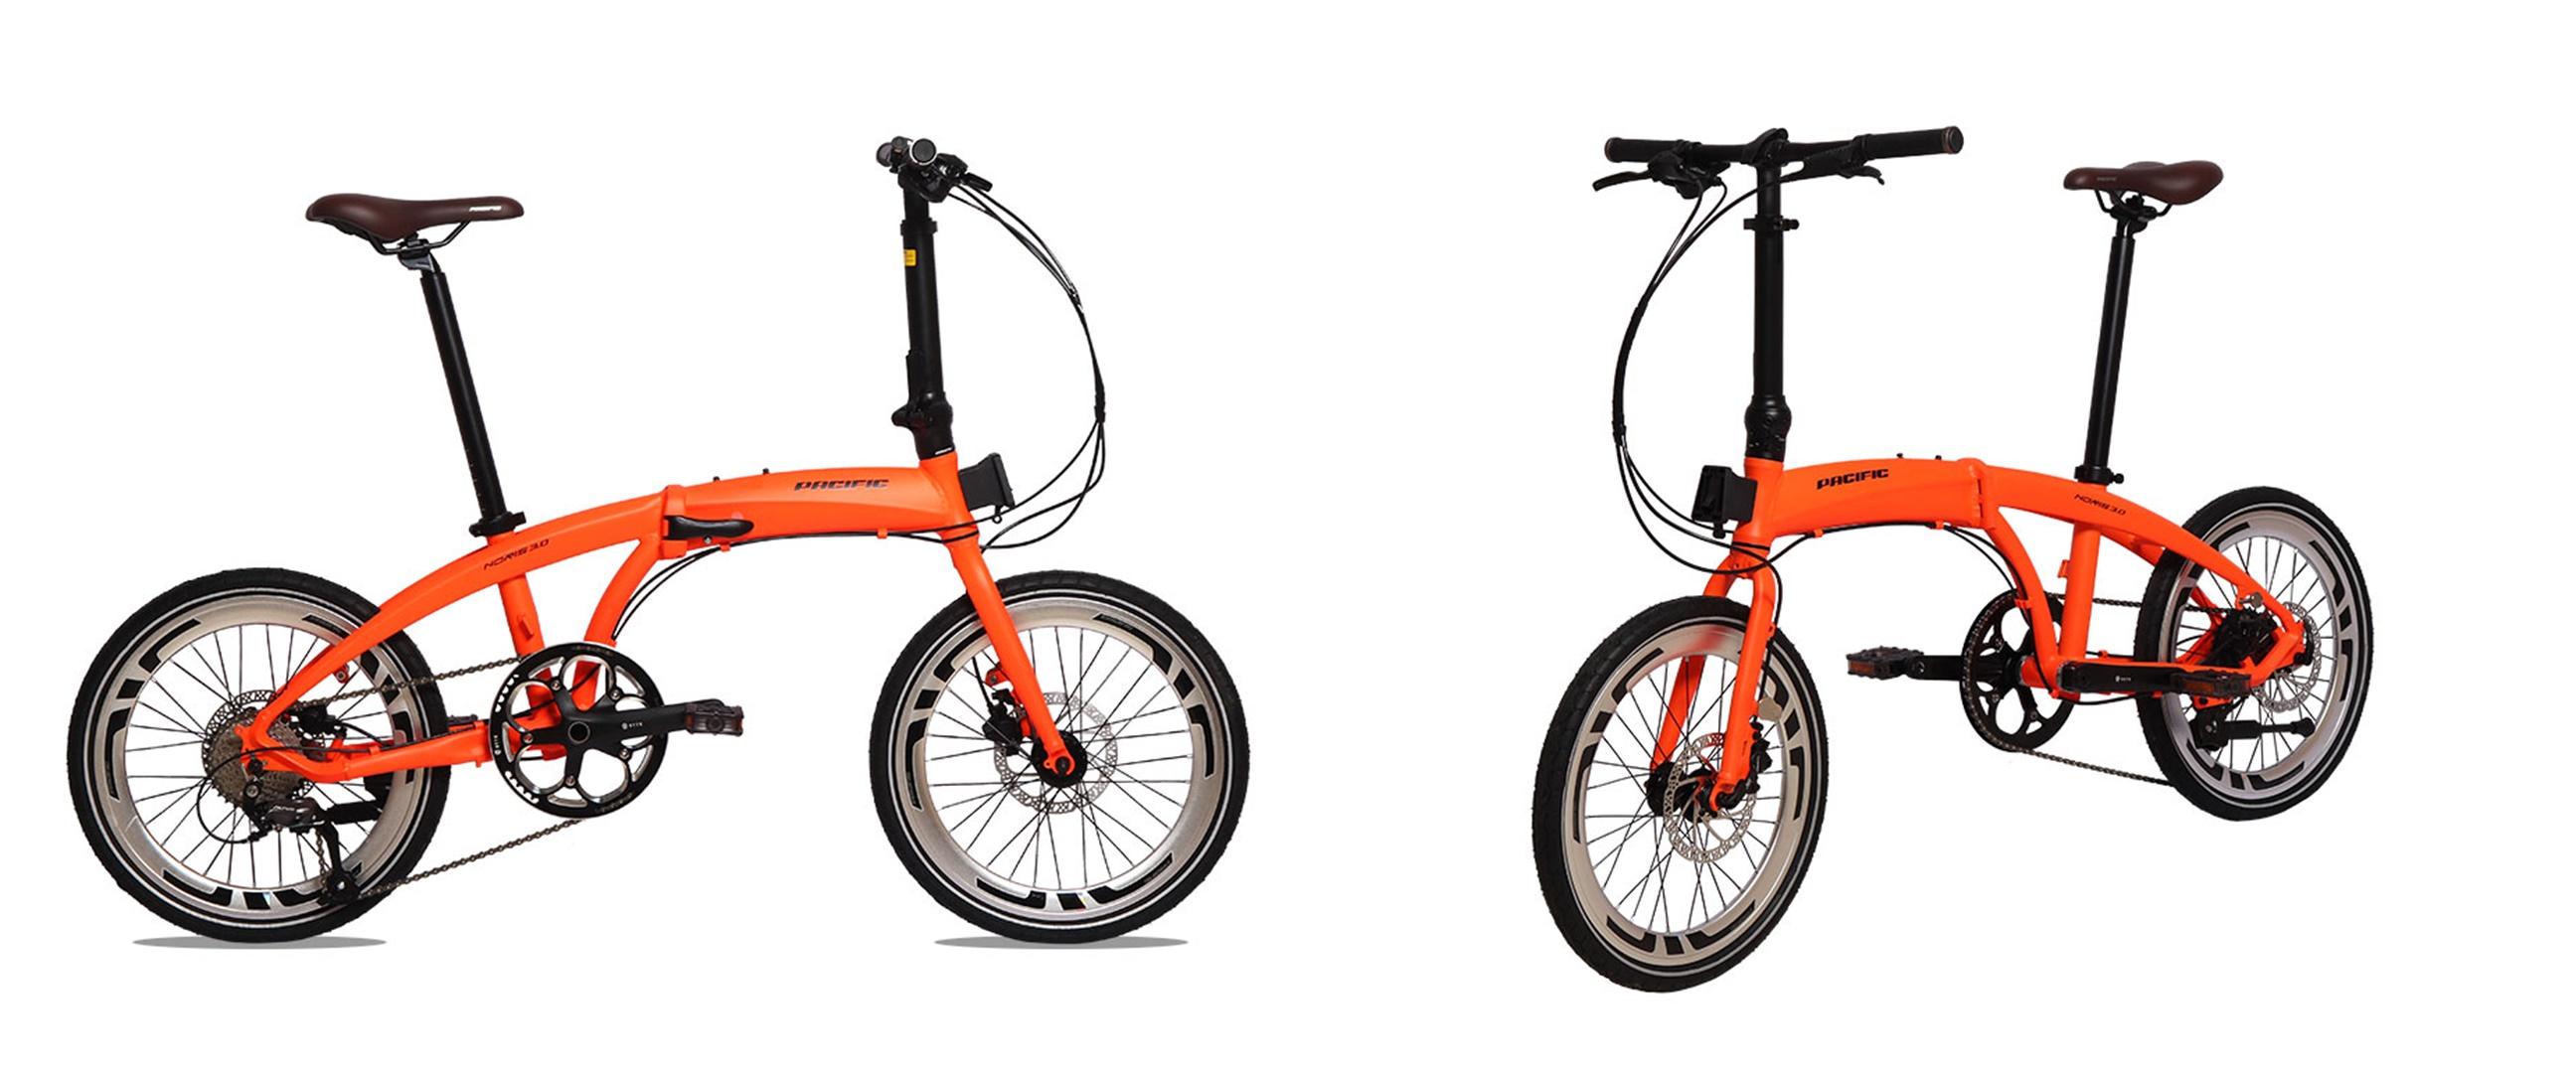 Harga sepeda lipat Pacific Noris 3.0 dan spesifikasi